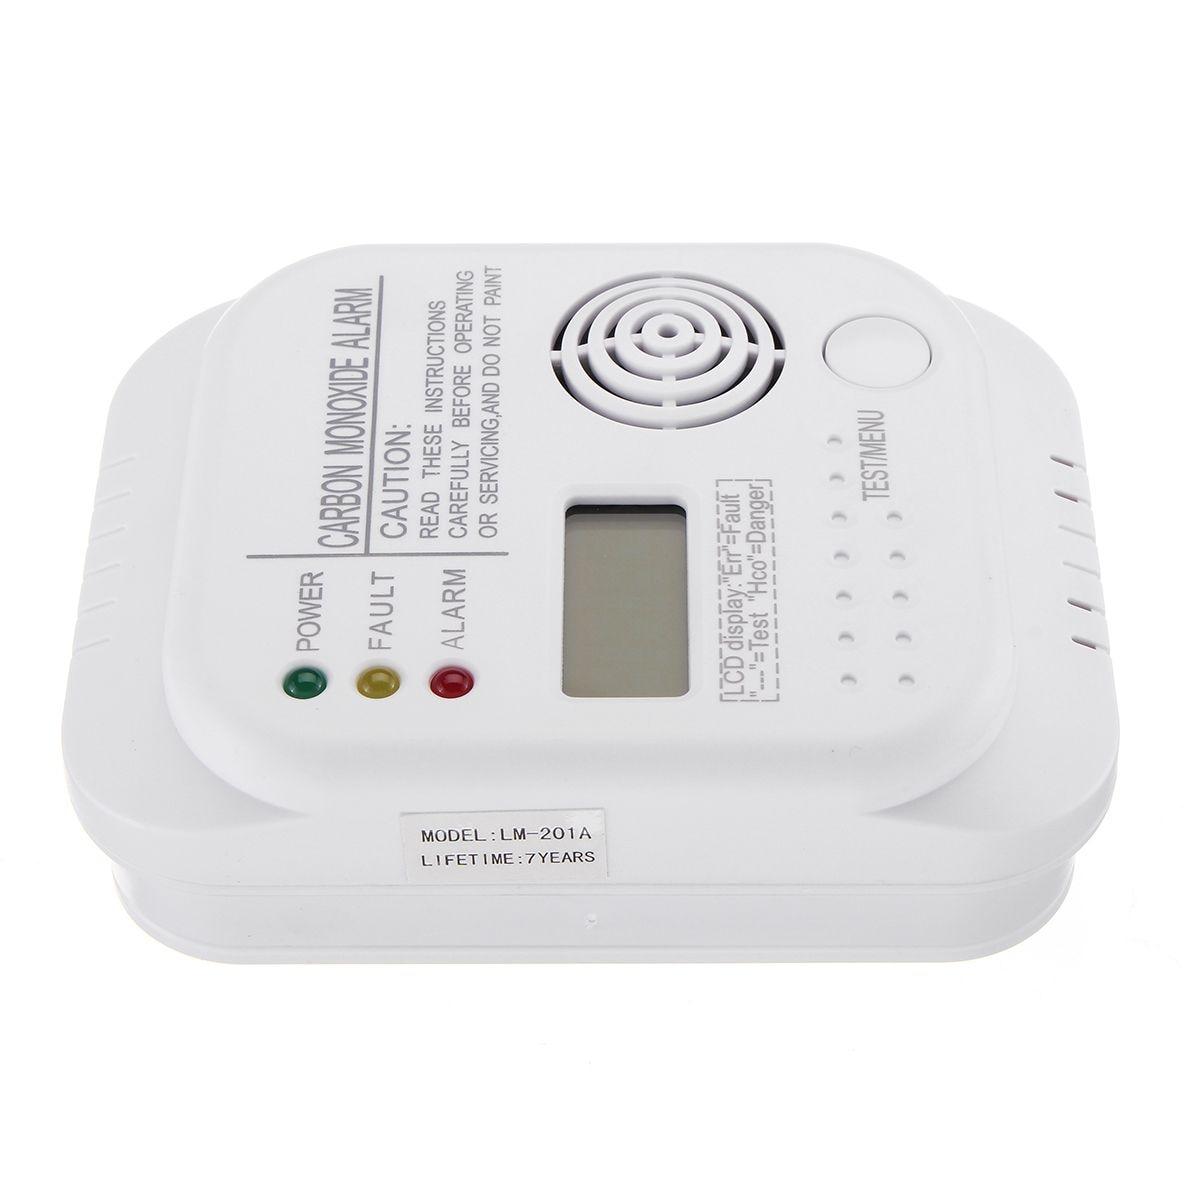 Fire Protection Carbon Monoxide Detectors New Safurance Co Carbon Monoxide Alarm Detector Lcd Digital Home Security Indepedent Sensor Safety